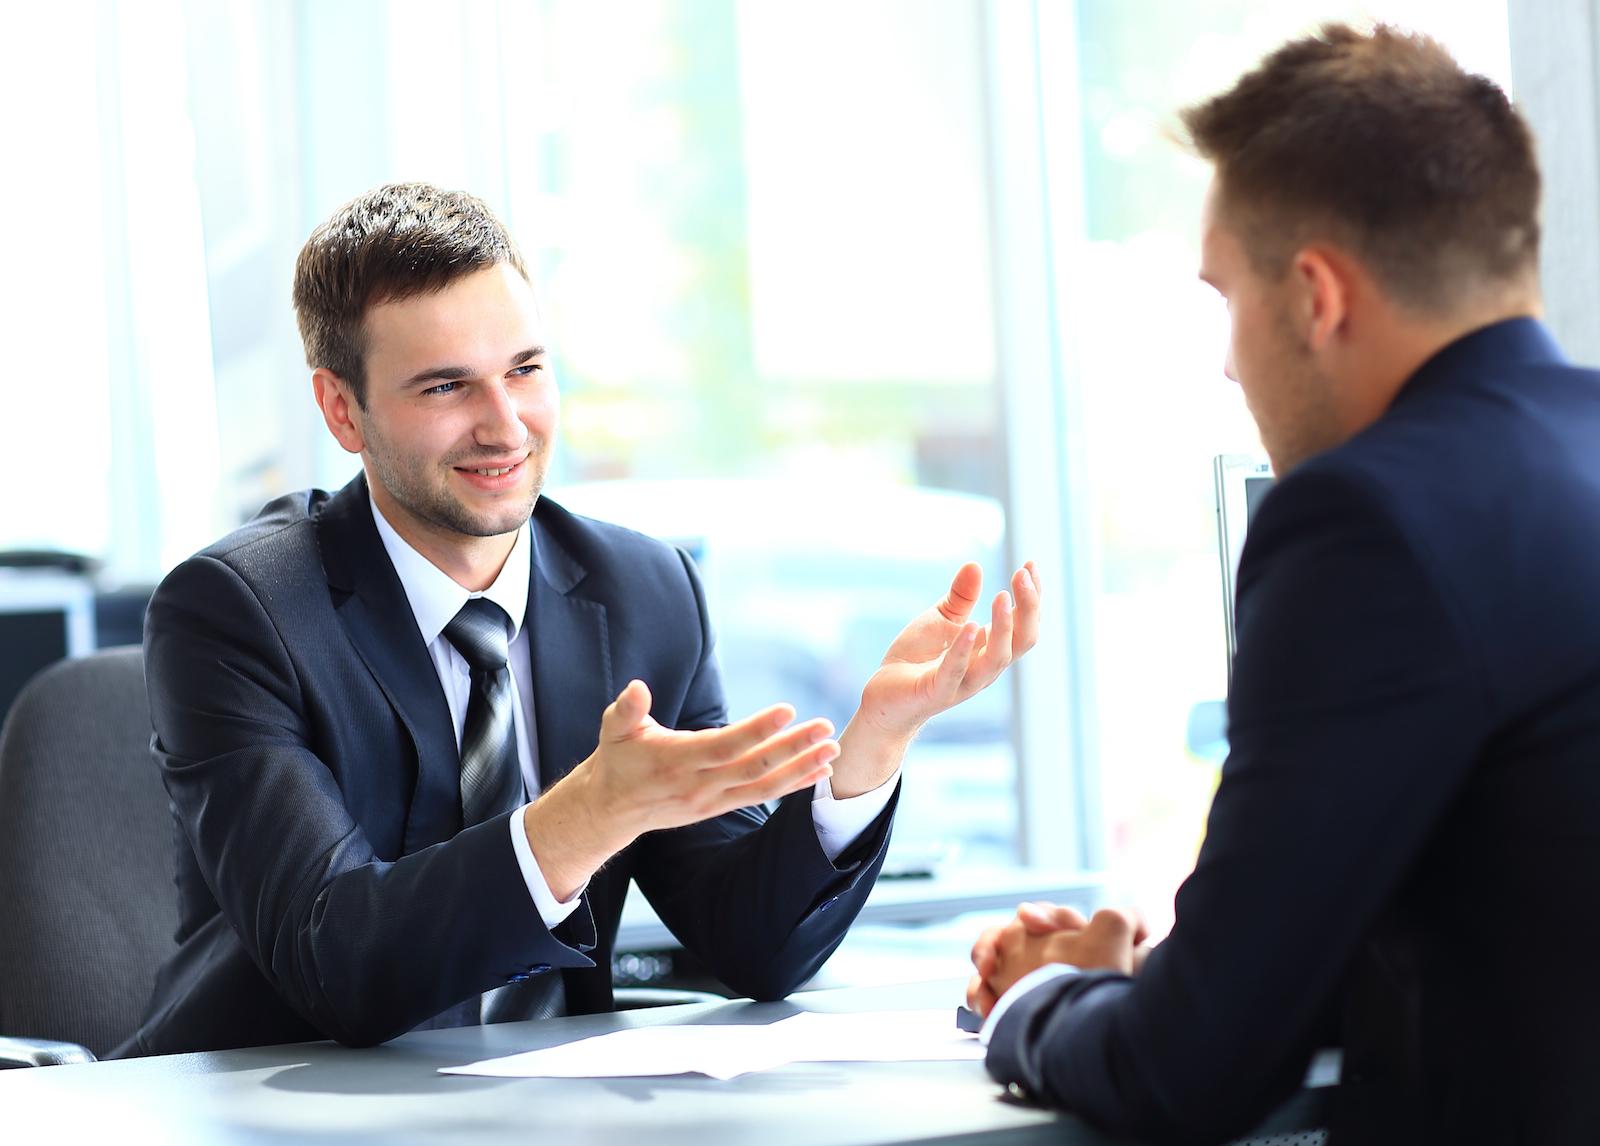 man interviewing